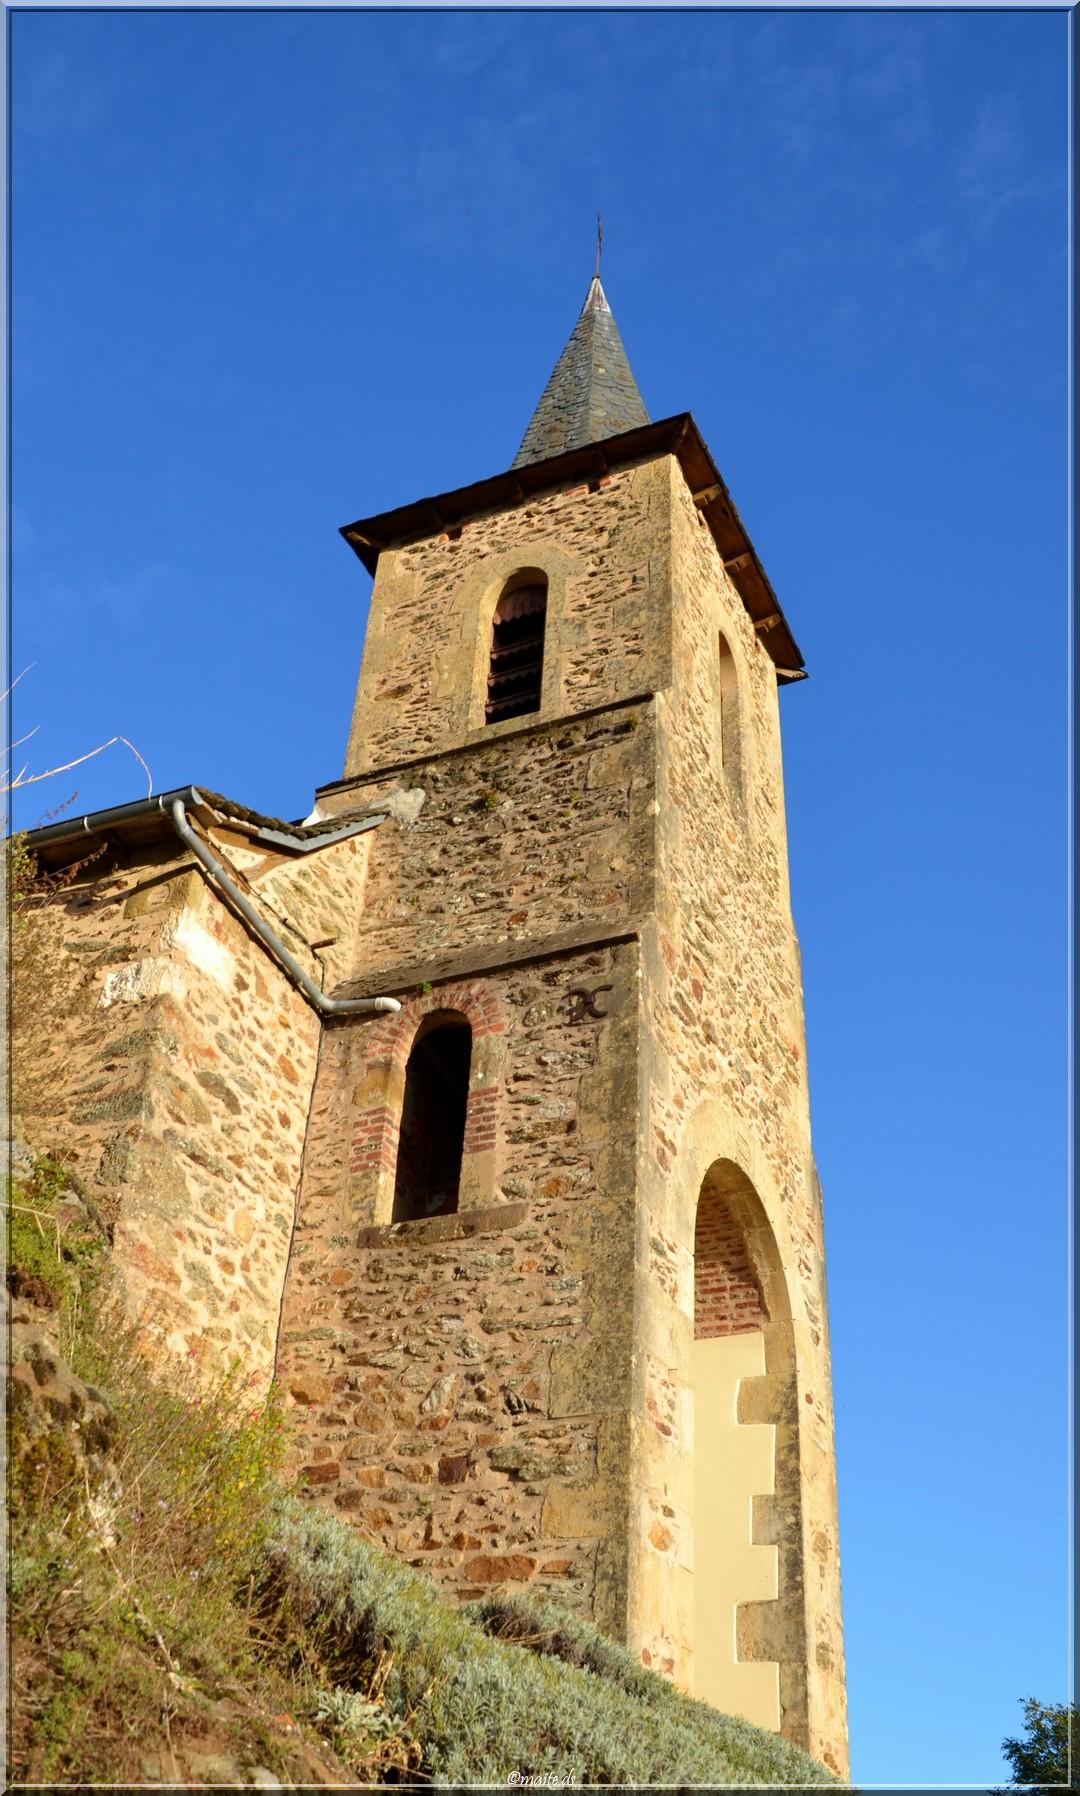 Château de Gironde - St-Parthem - Aveyron